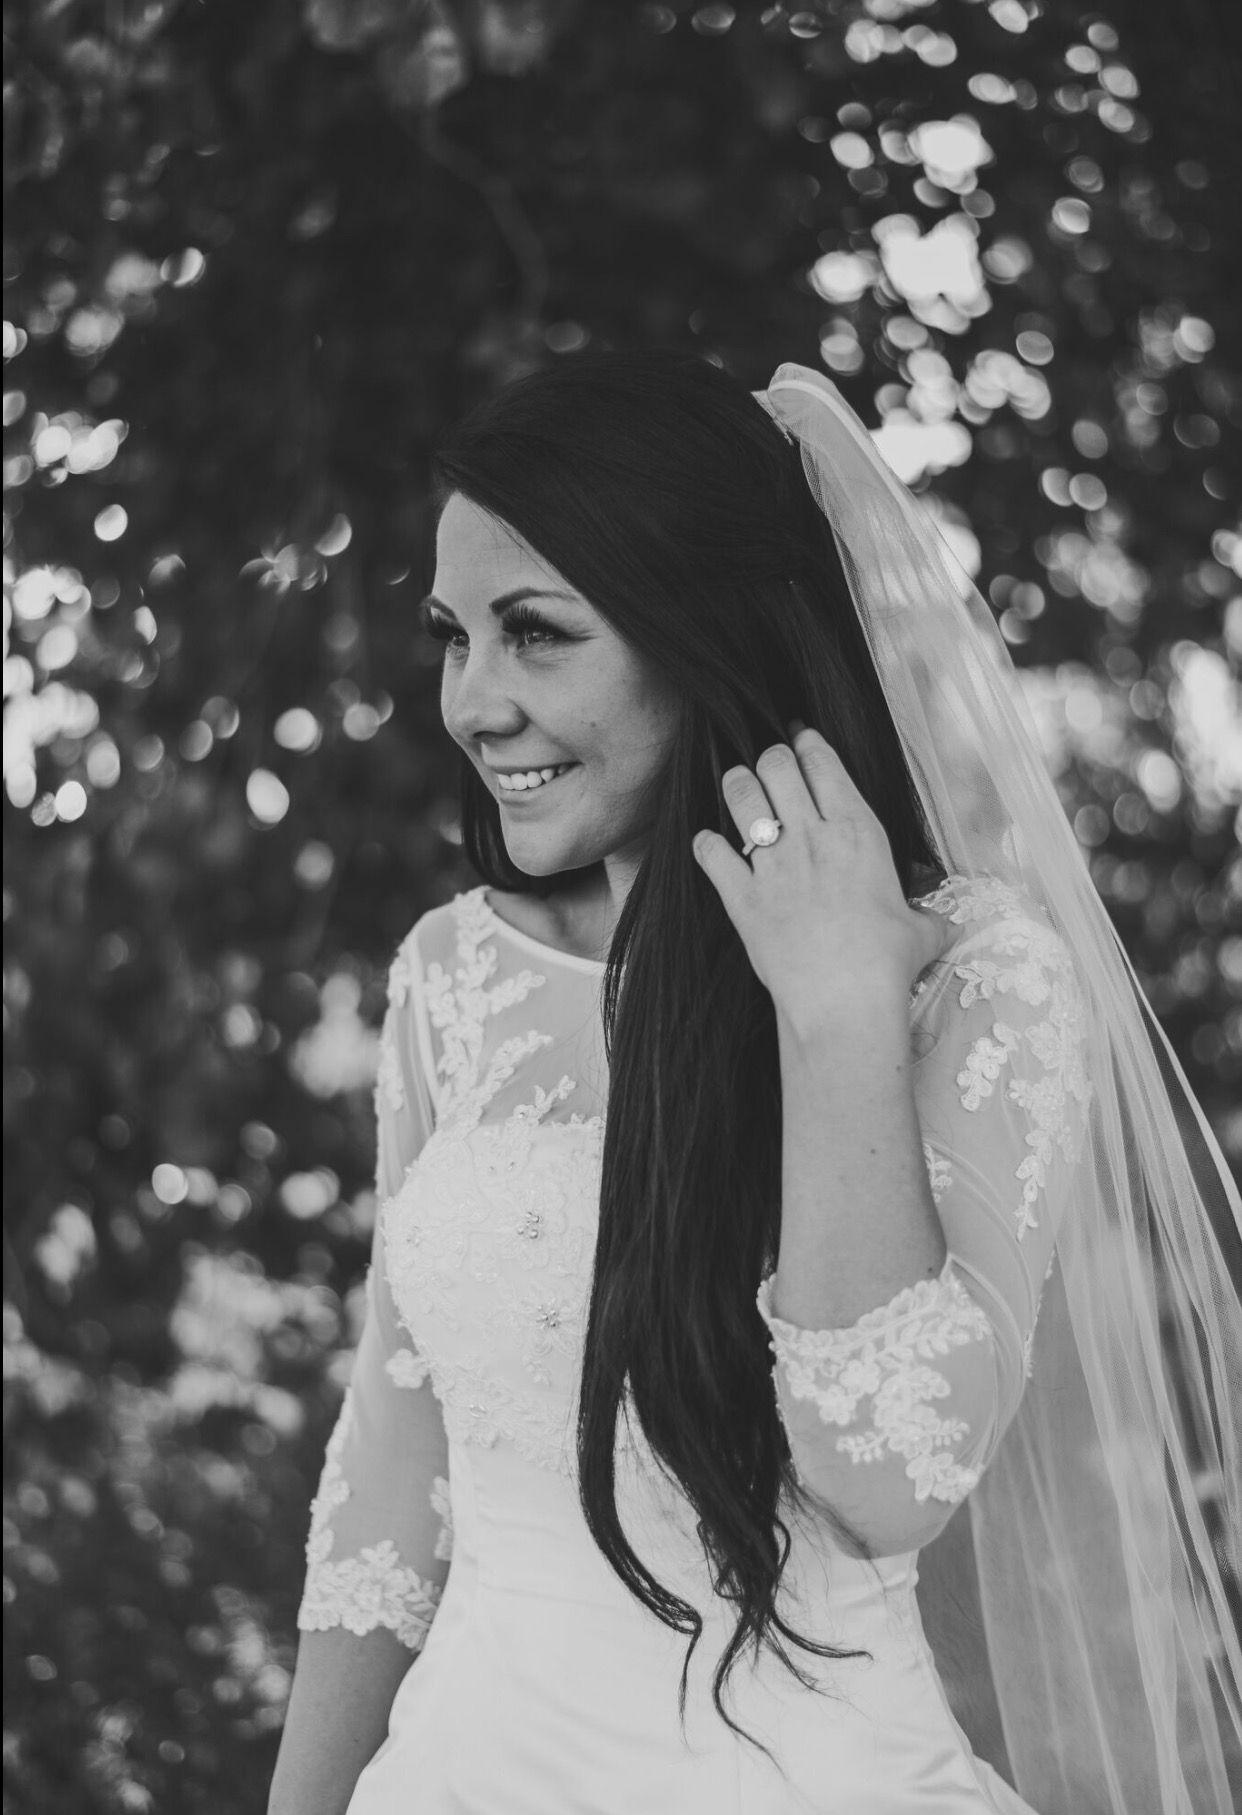 Malmrose Bridal white, ivory, wedding dress, outdoor wedding, flowy ...